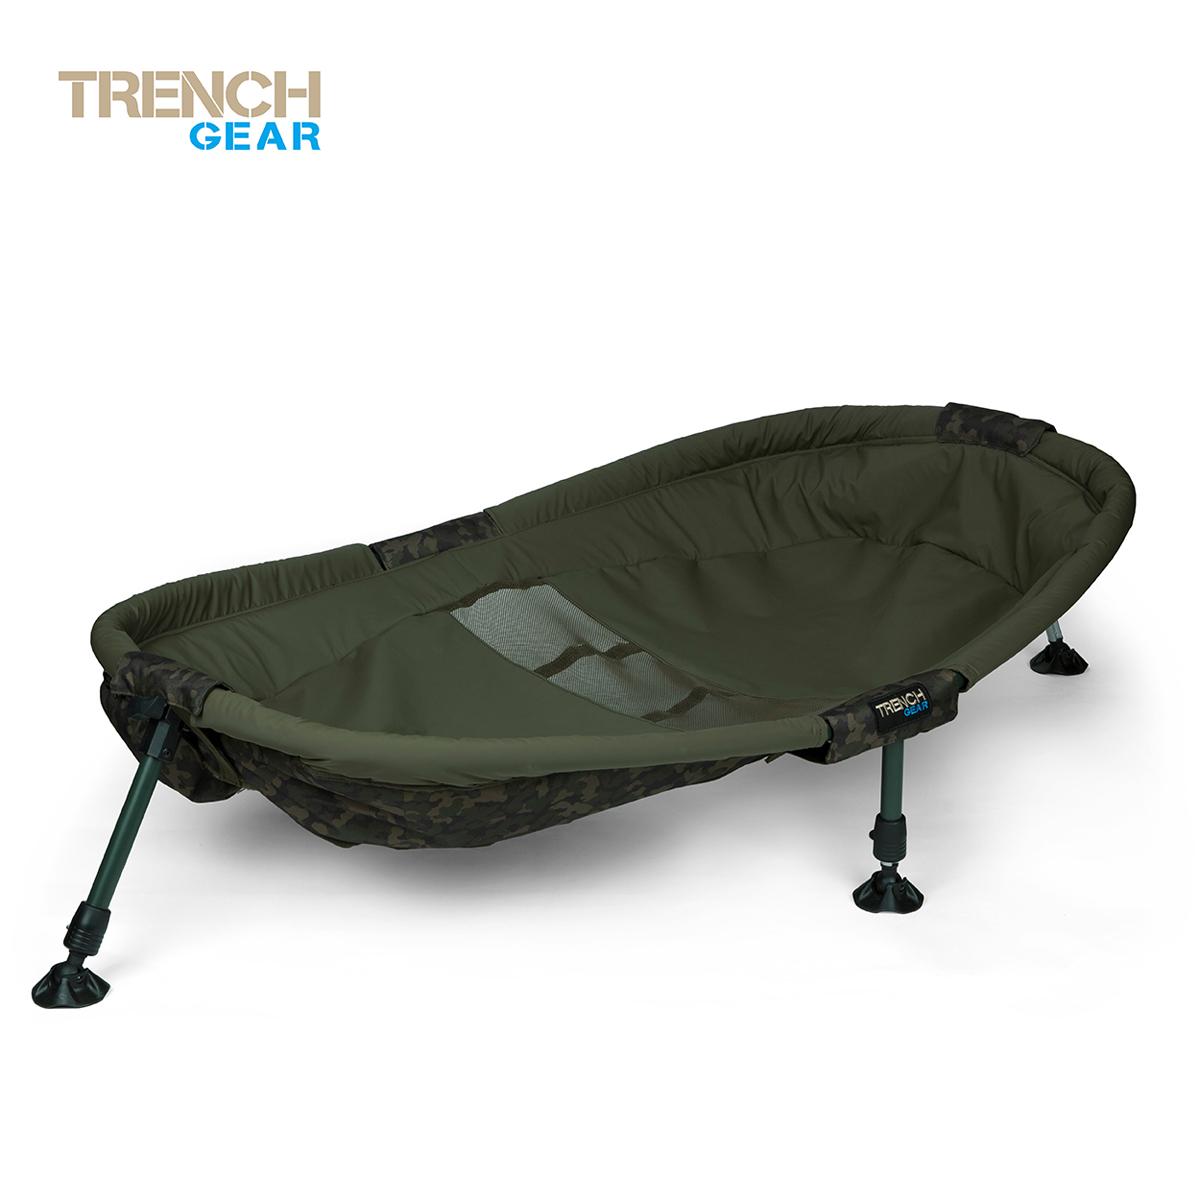 Shimano Trench Euro Cradle Incl. Bag & AQ Strap